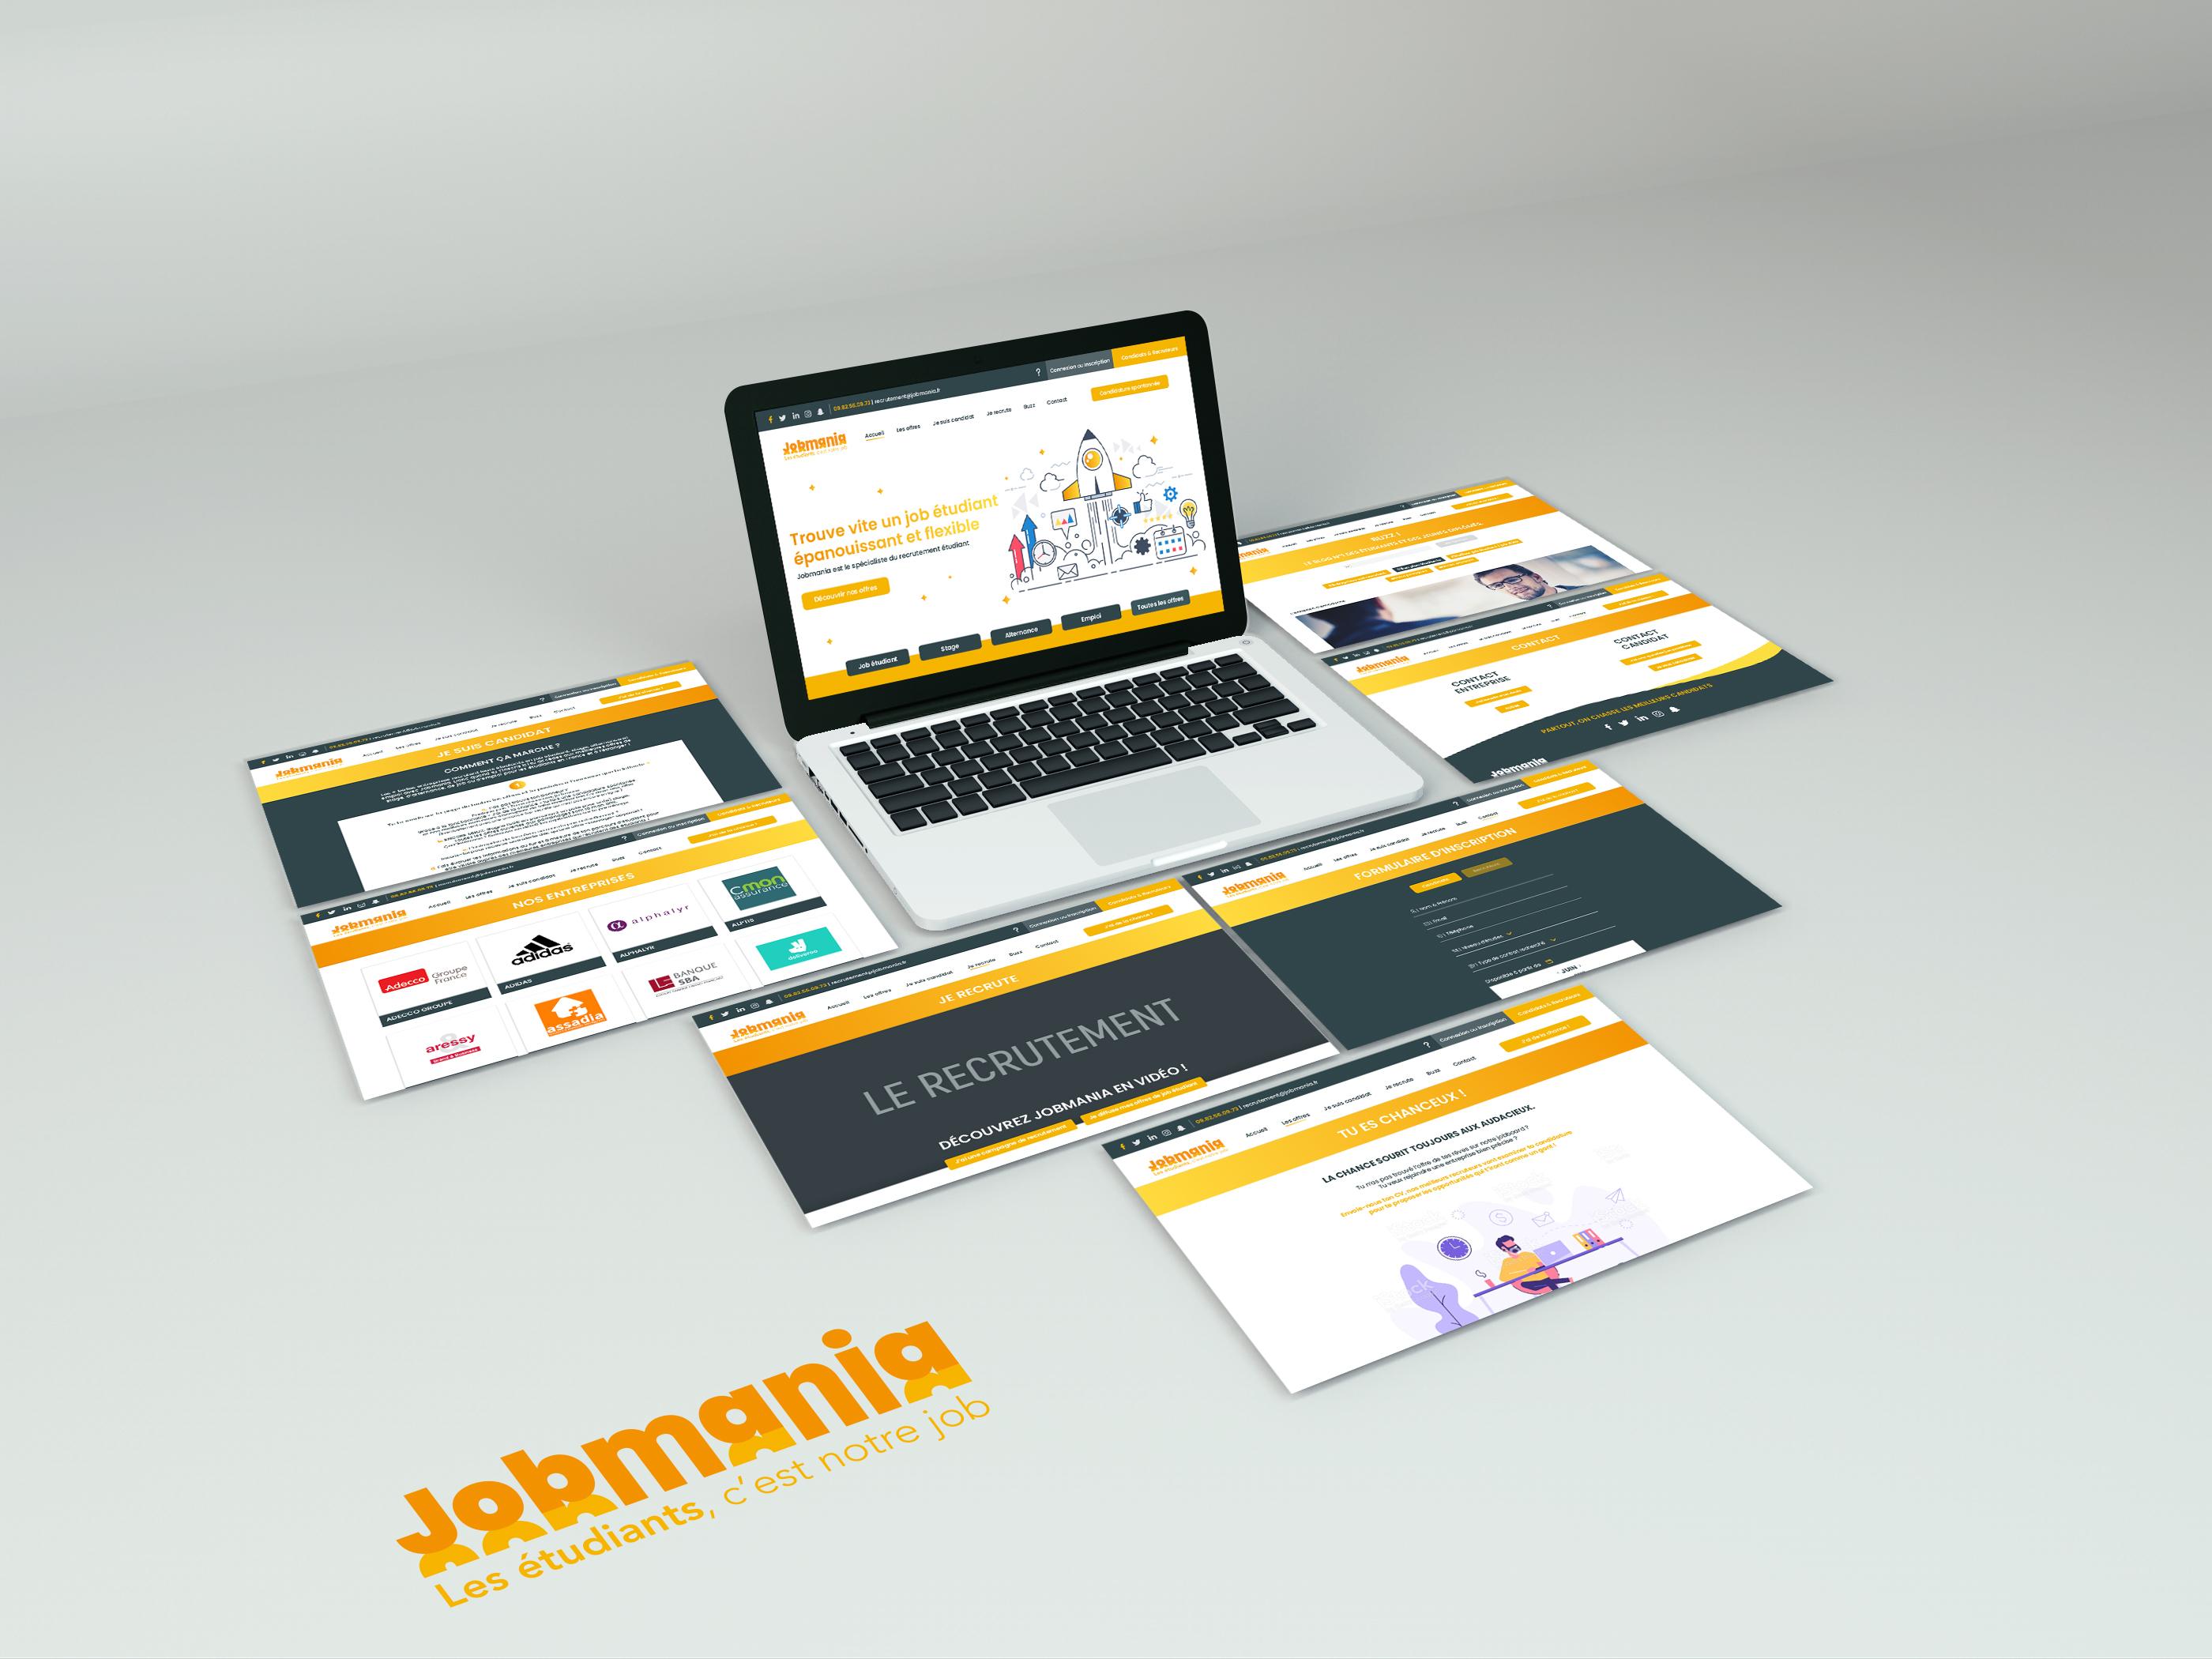 JOBMANIA_Site_Mockup